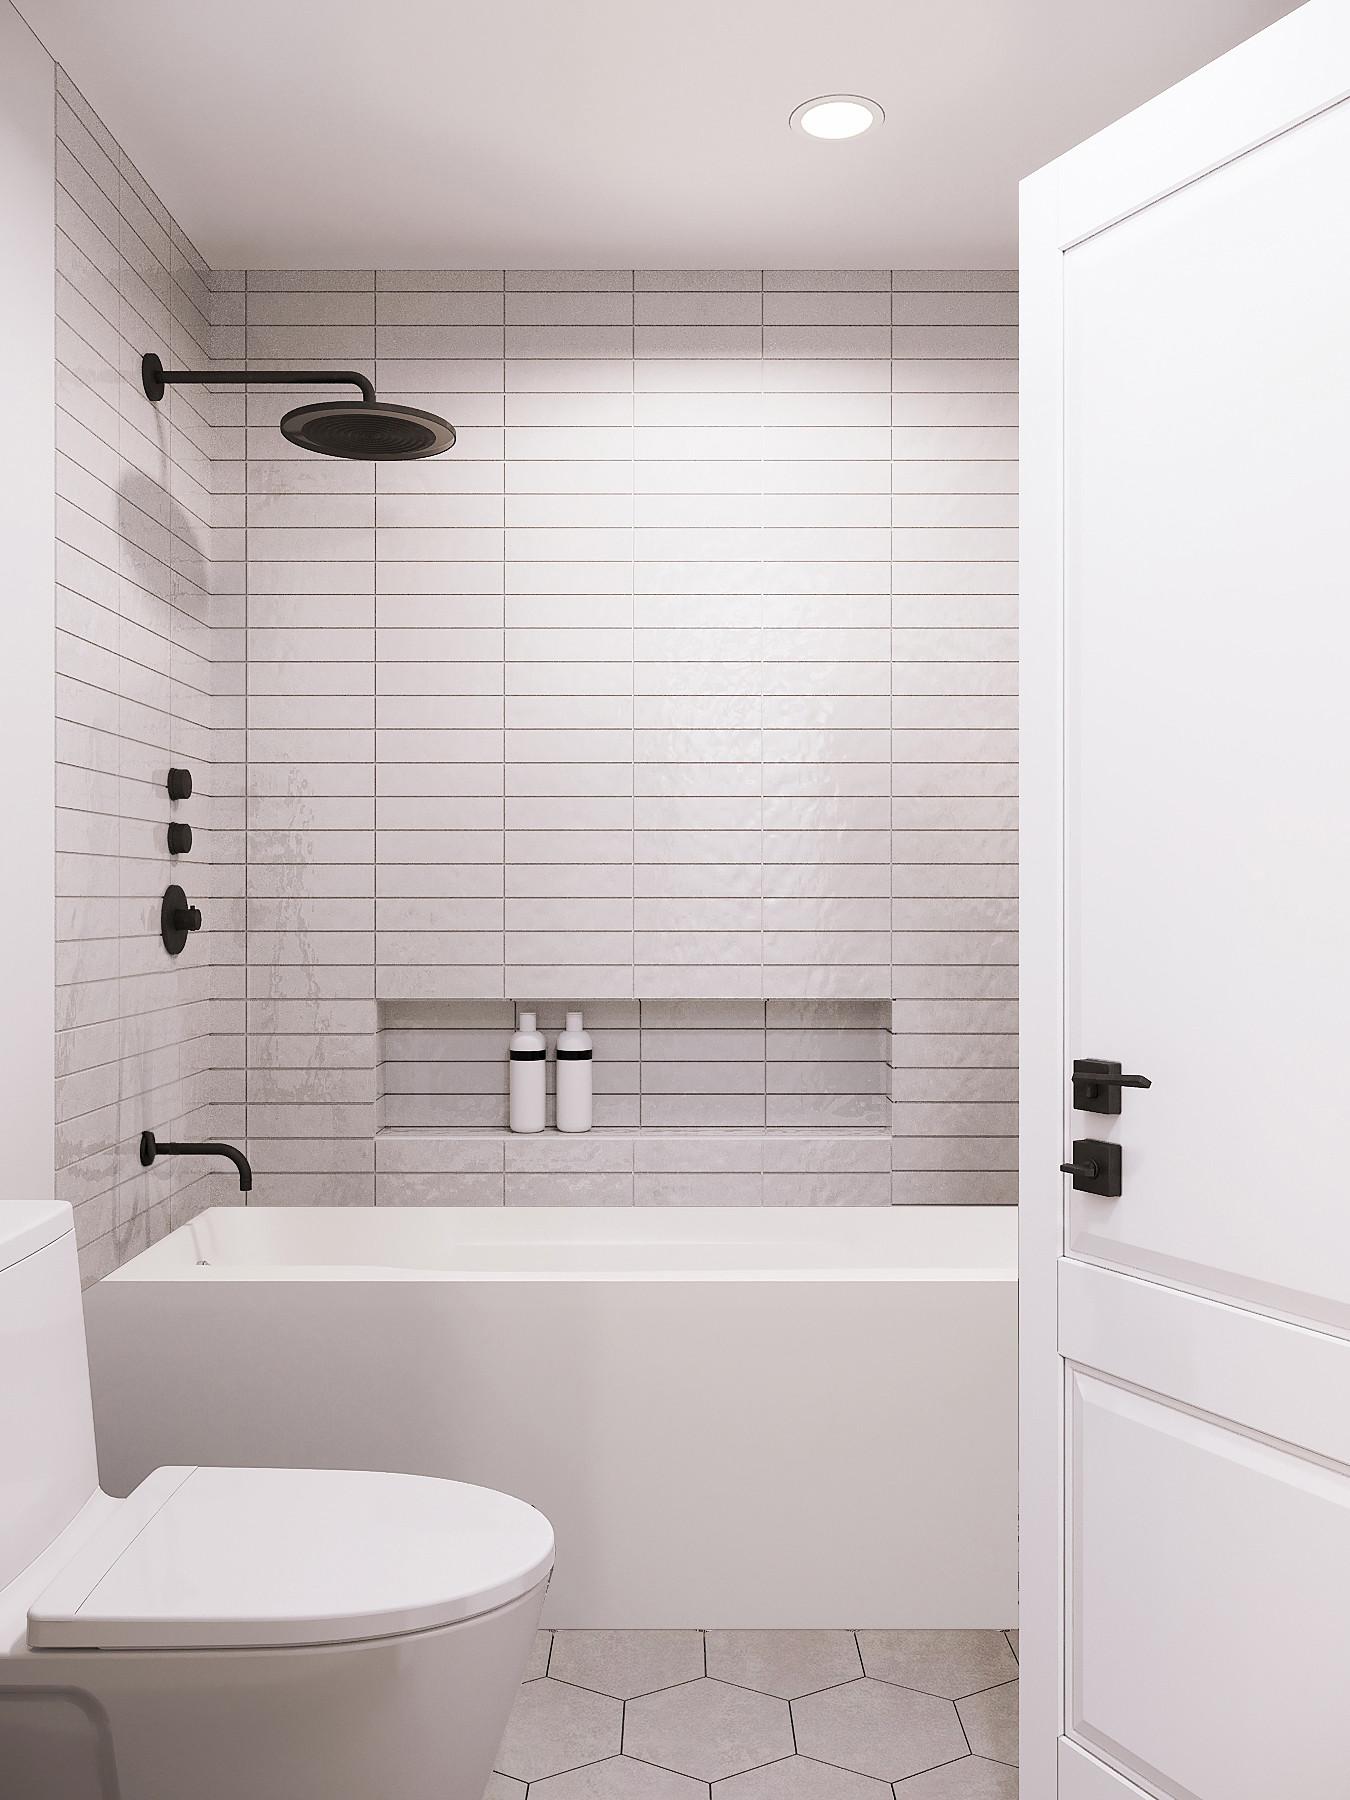 Home Remodel Saratoga - Kids Bathroom